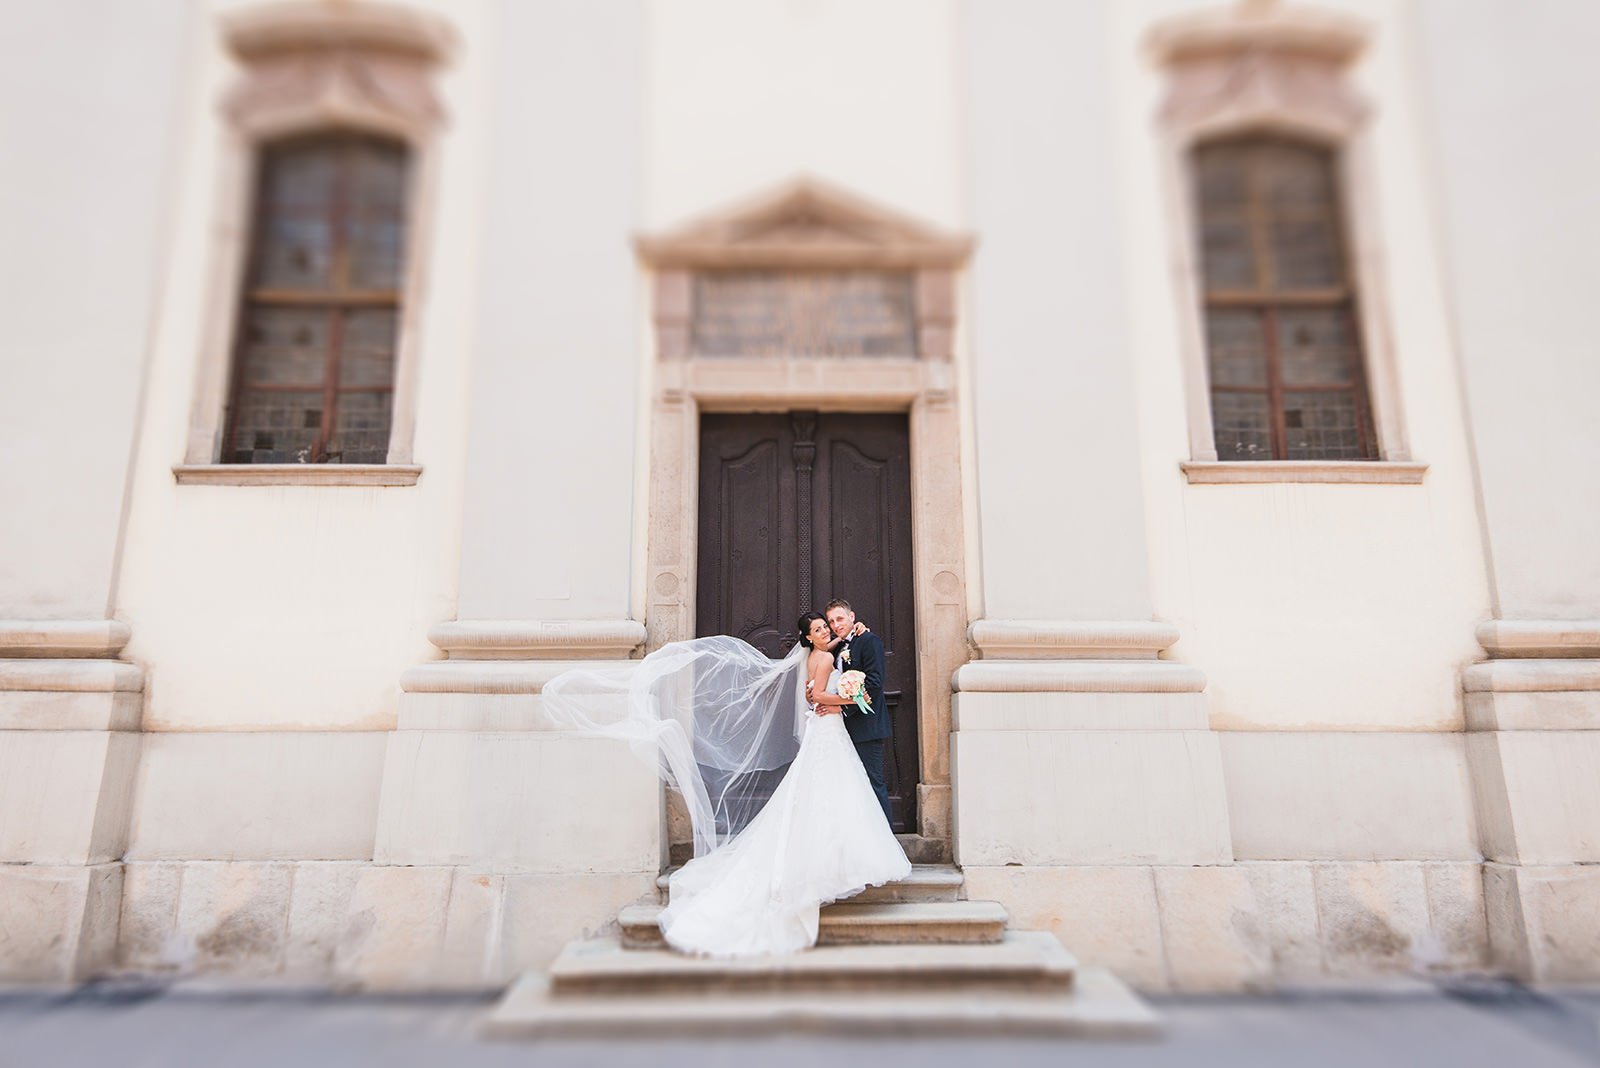 Mioara & Ionut – Fotografie Nunta